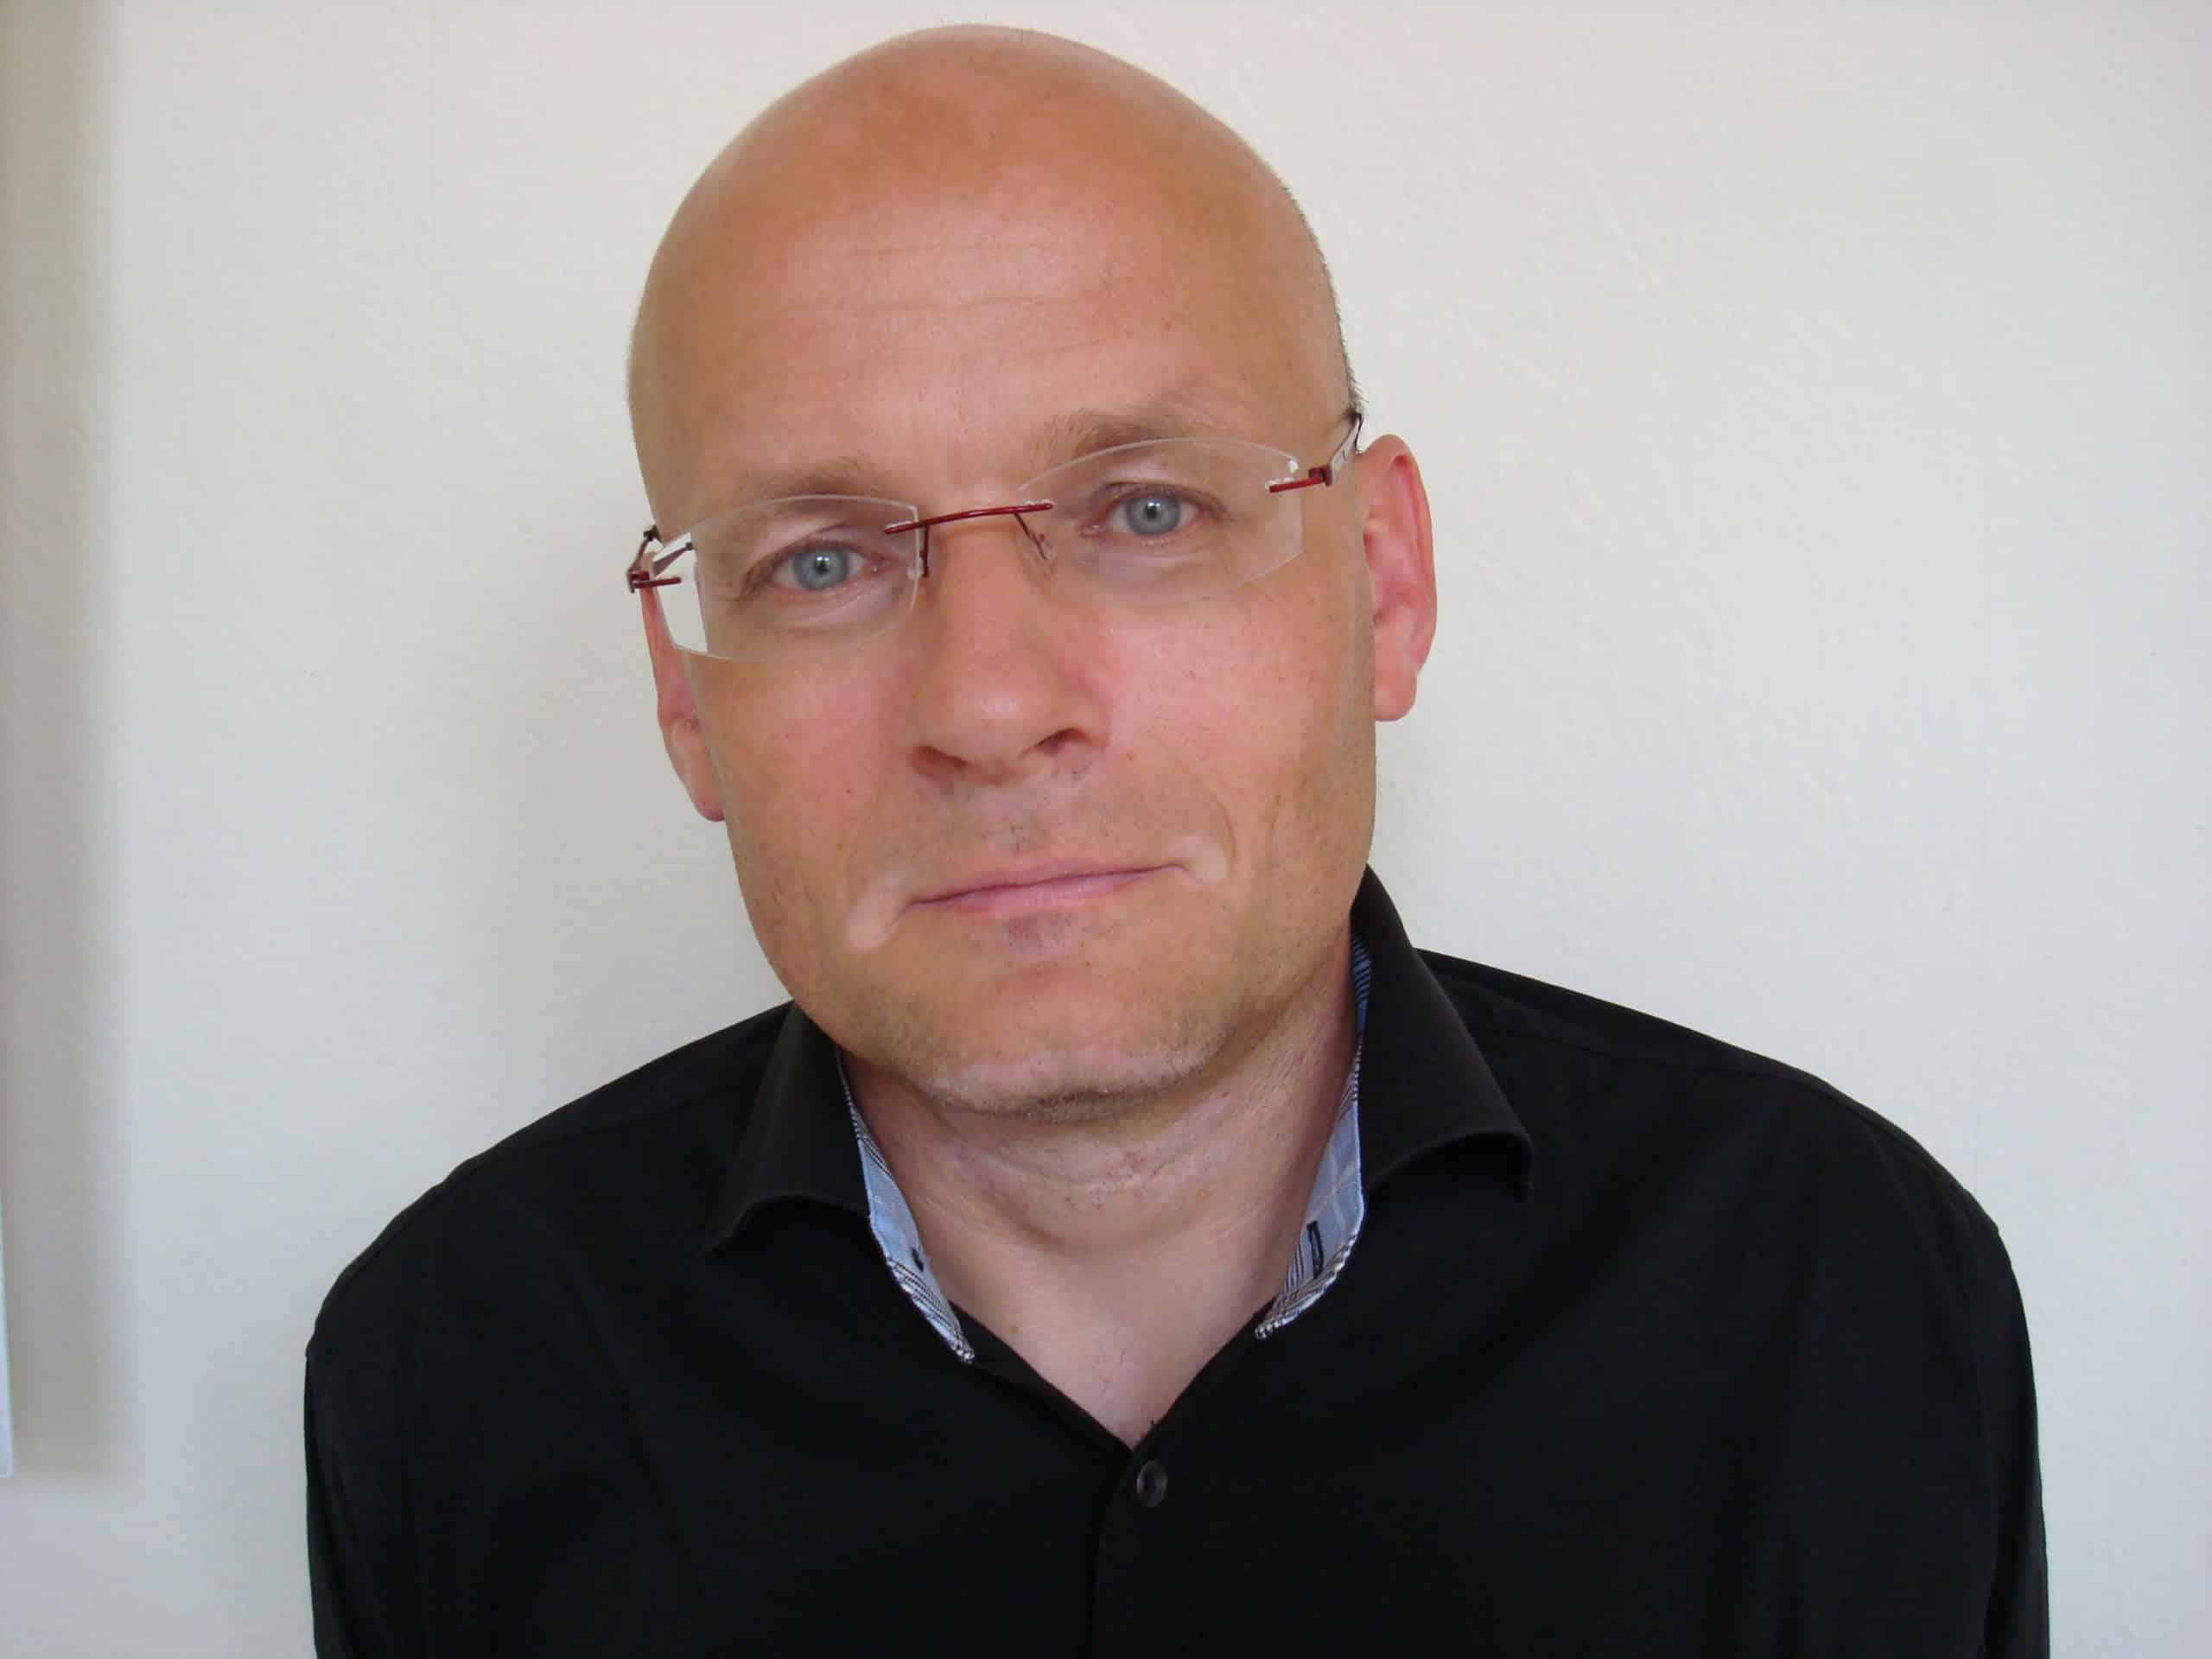 The Perspectivity Story of Simon Koolwijk